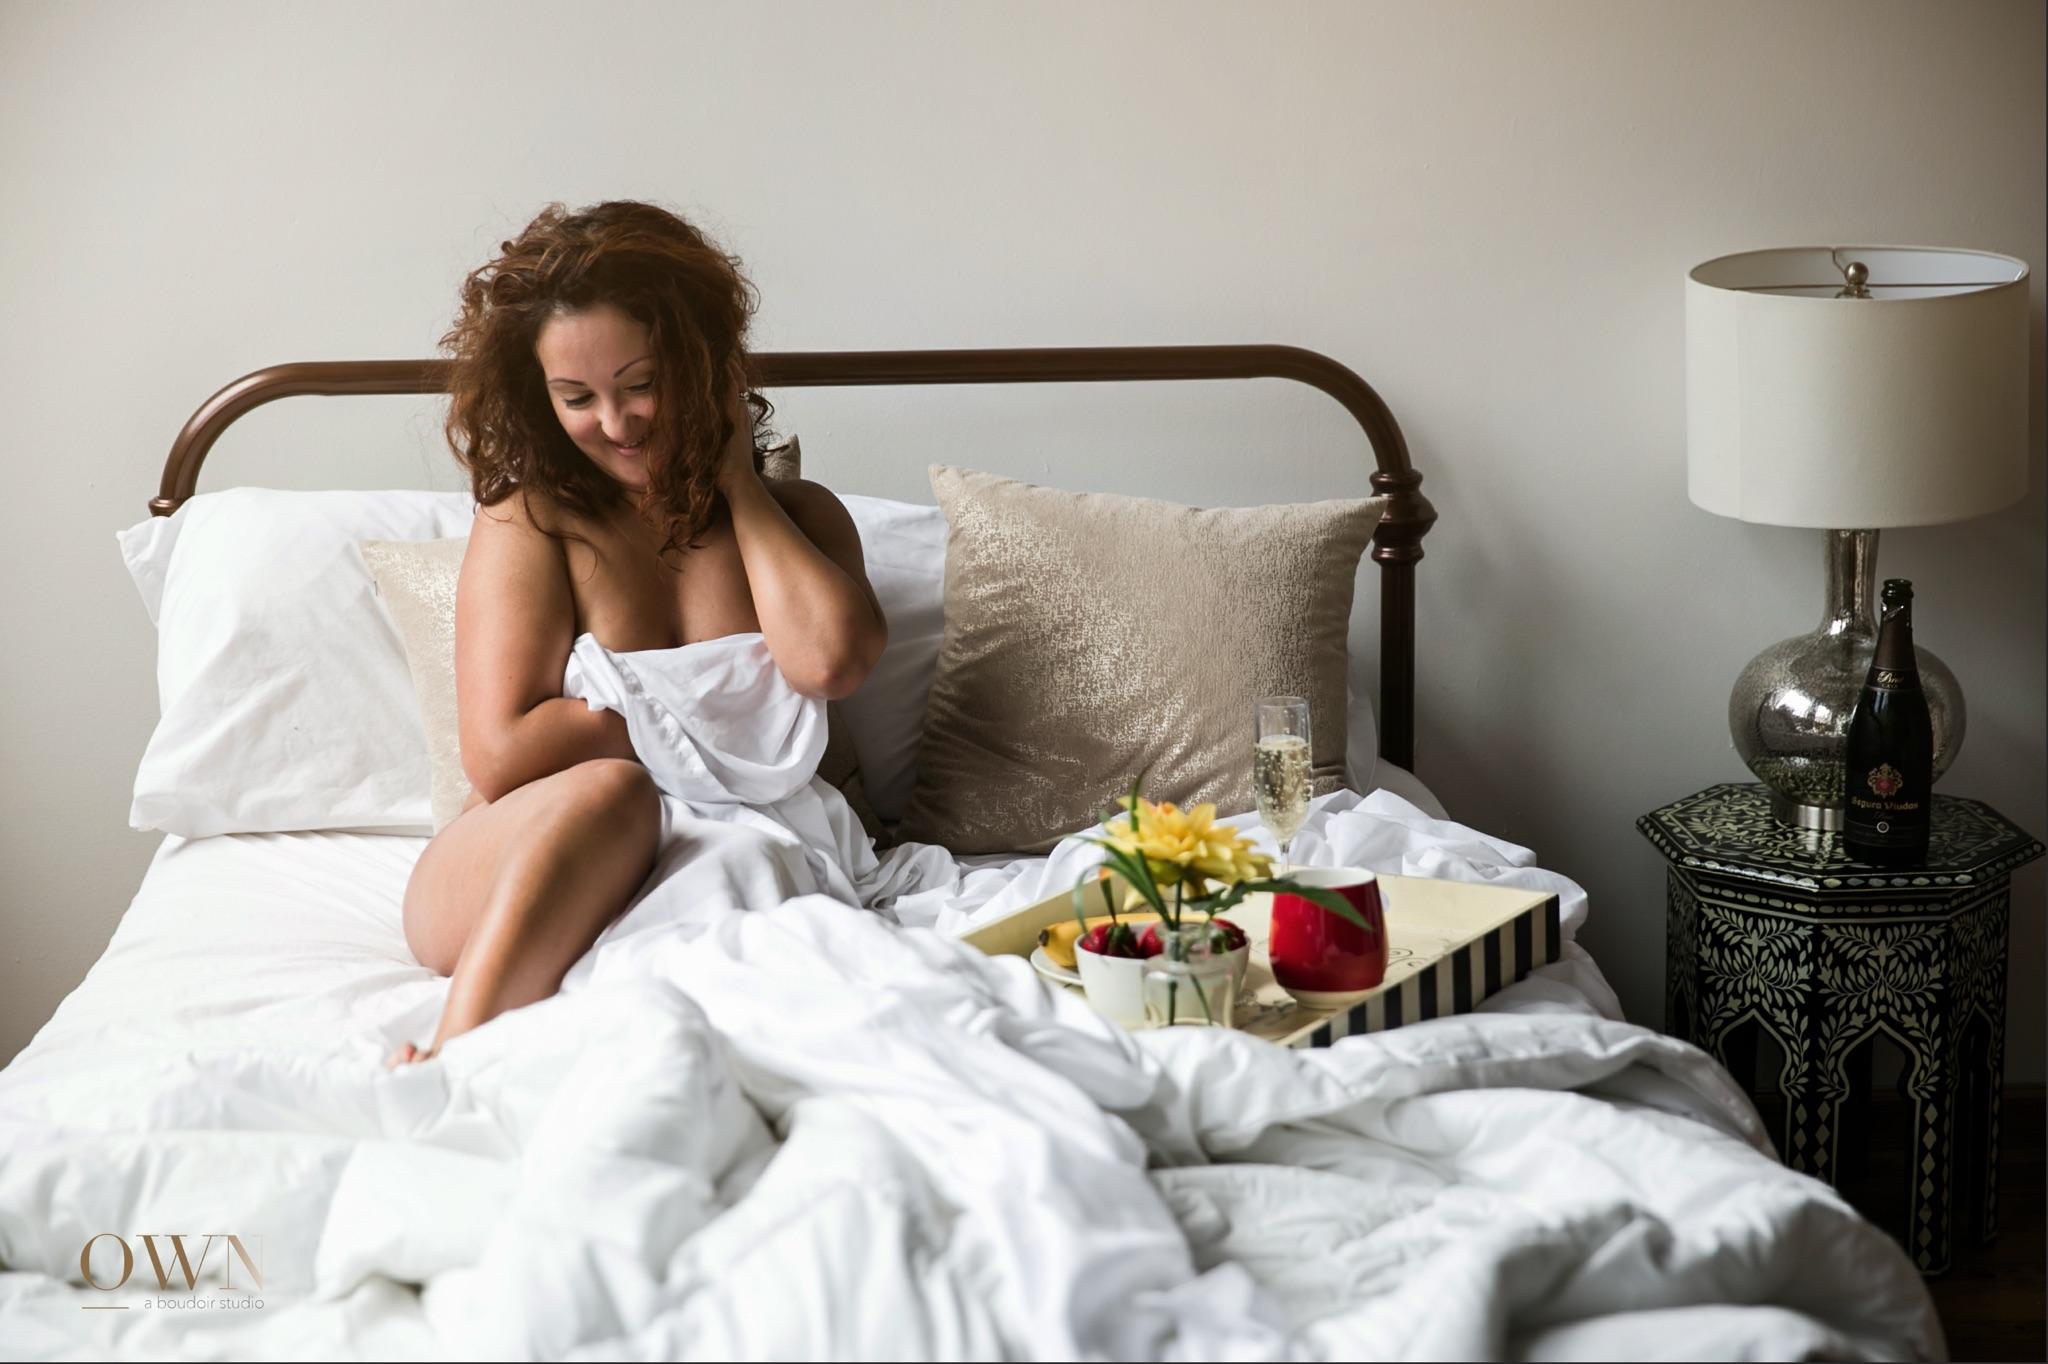 boudoir session, boudoir photography atlanta, atlanta boudoir photographer, mother's day boudoir, boudoir ideas